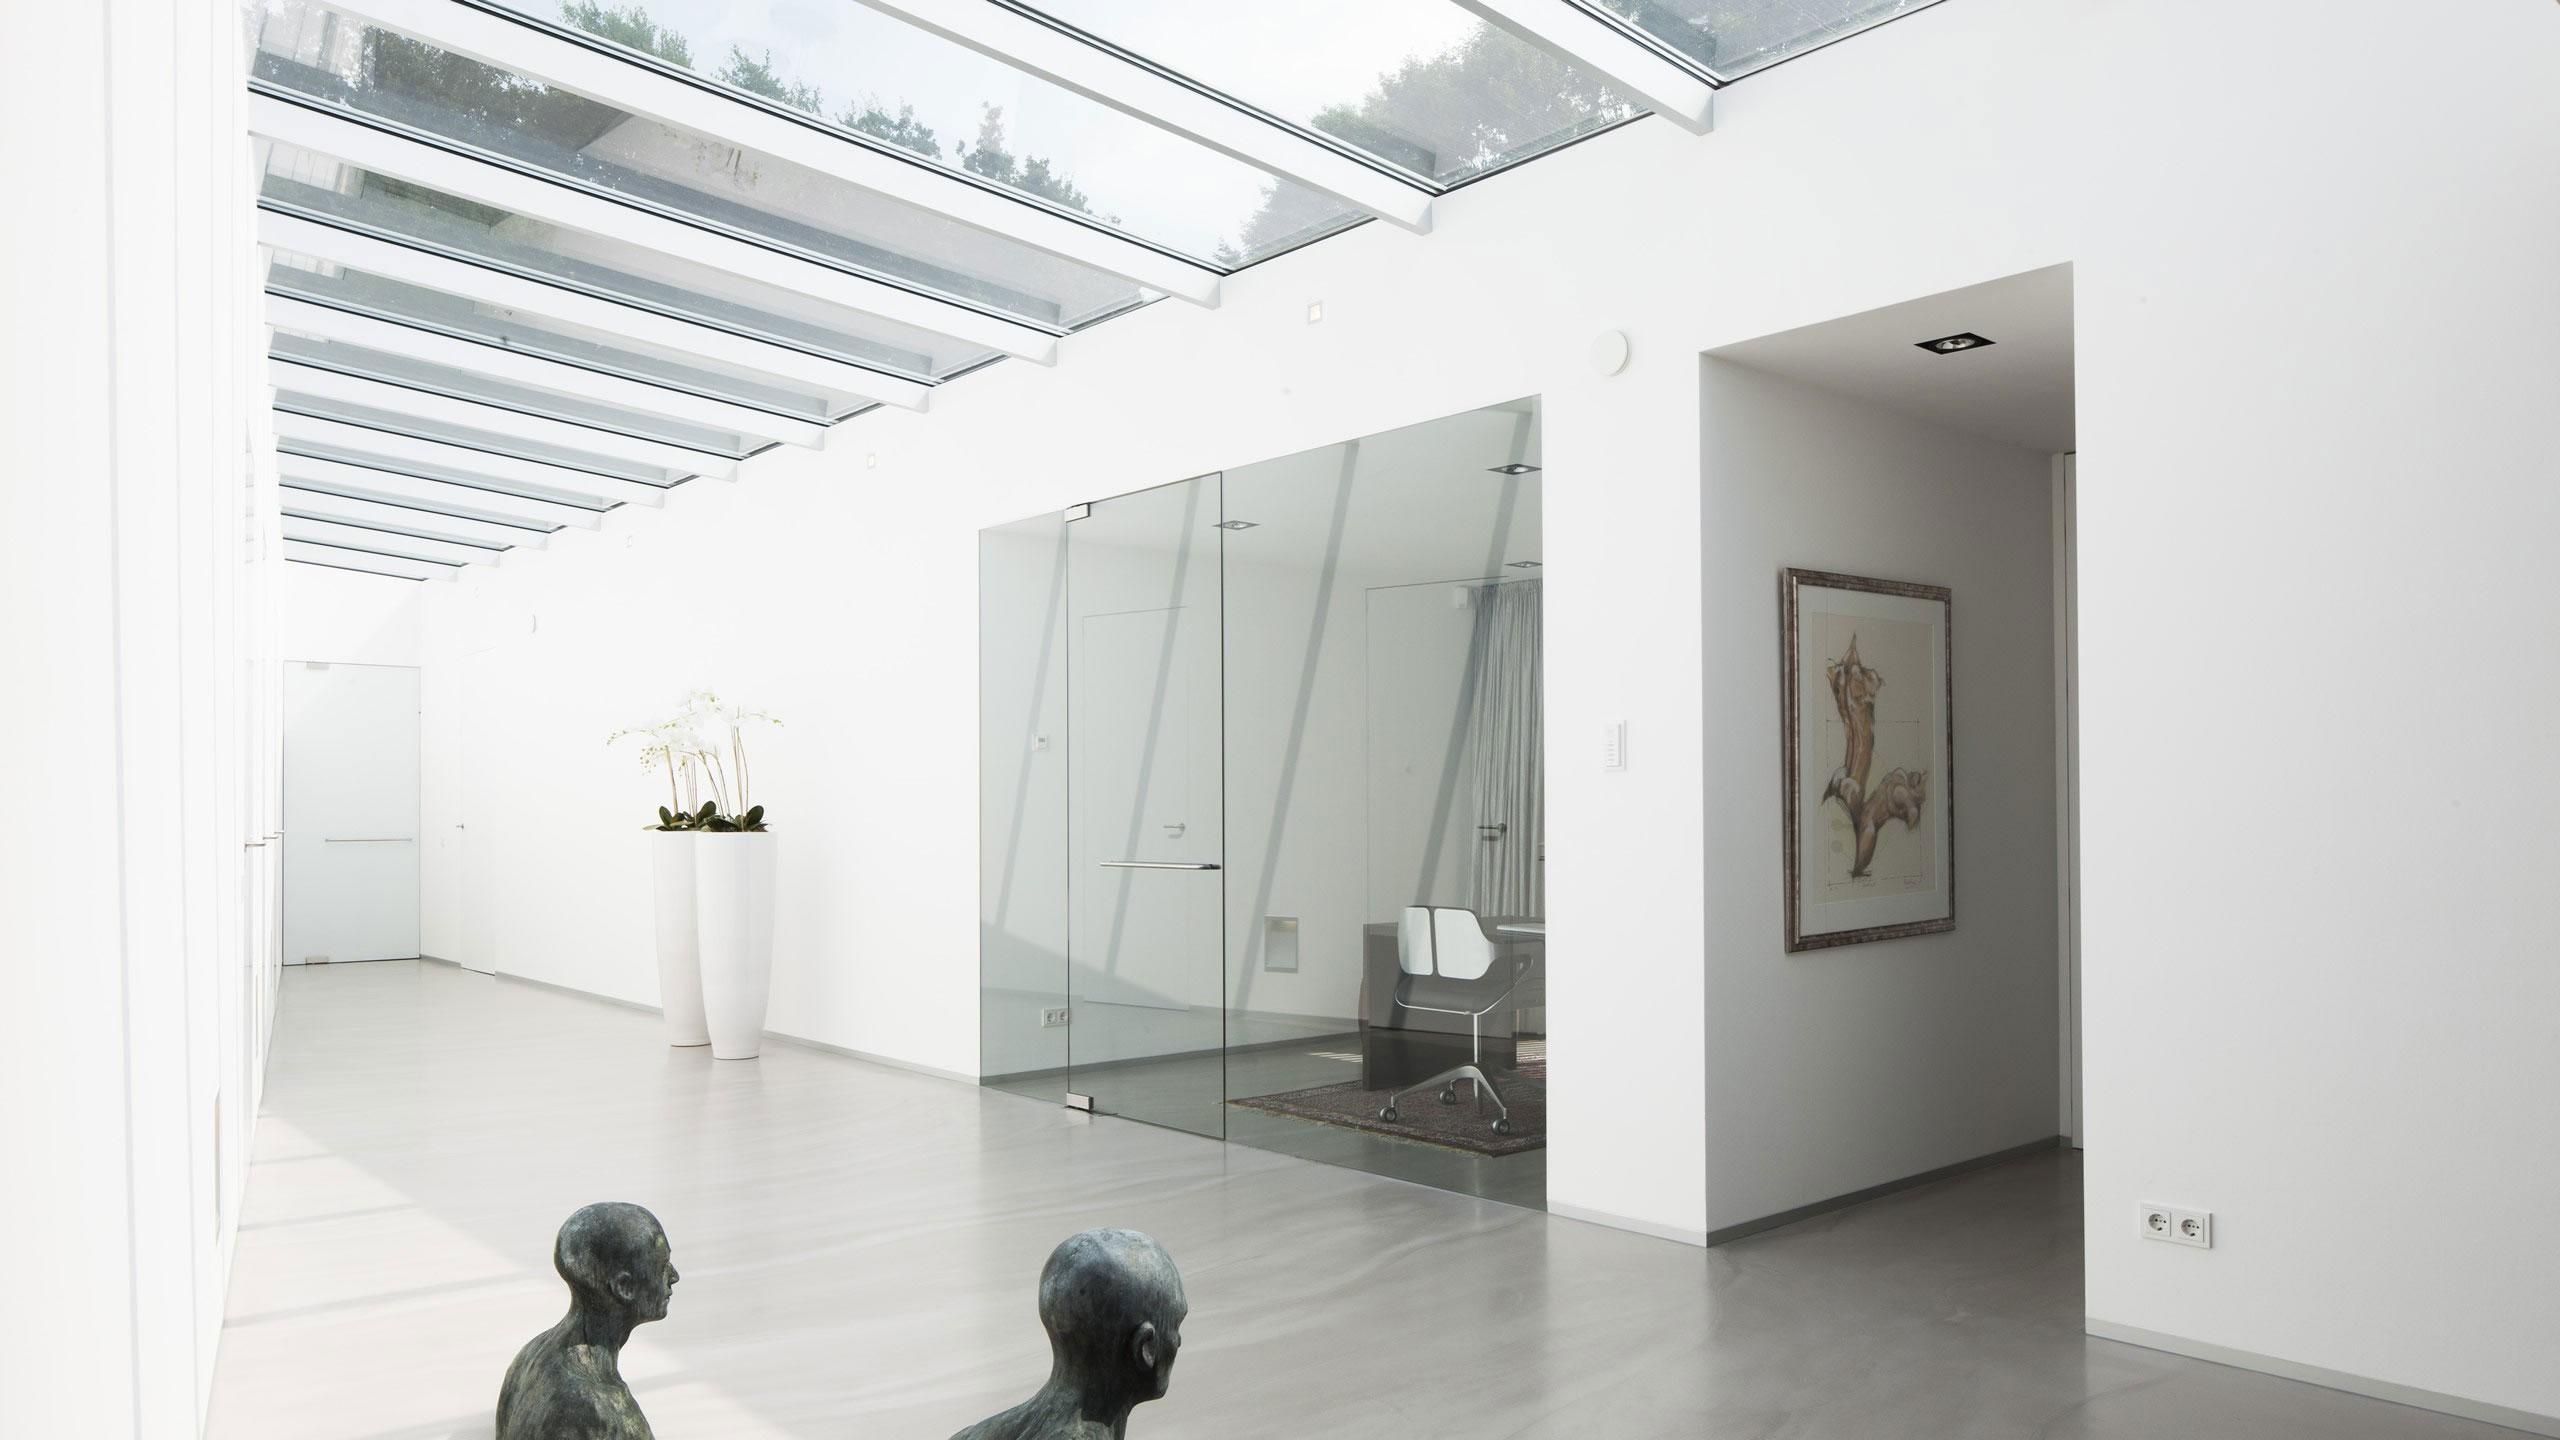 Boxed Villa Spee Haelen with Panoramic Windows by Lab32 architecten-29